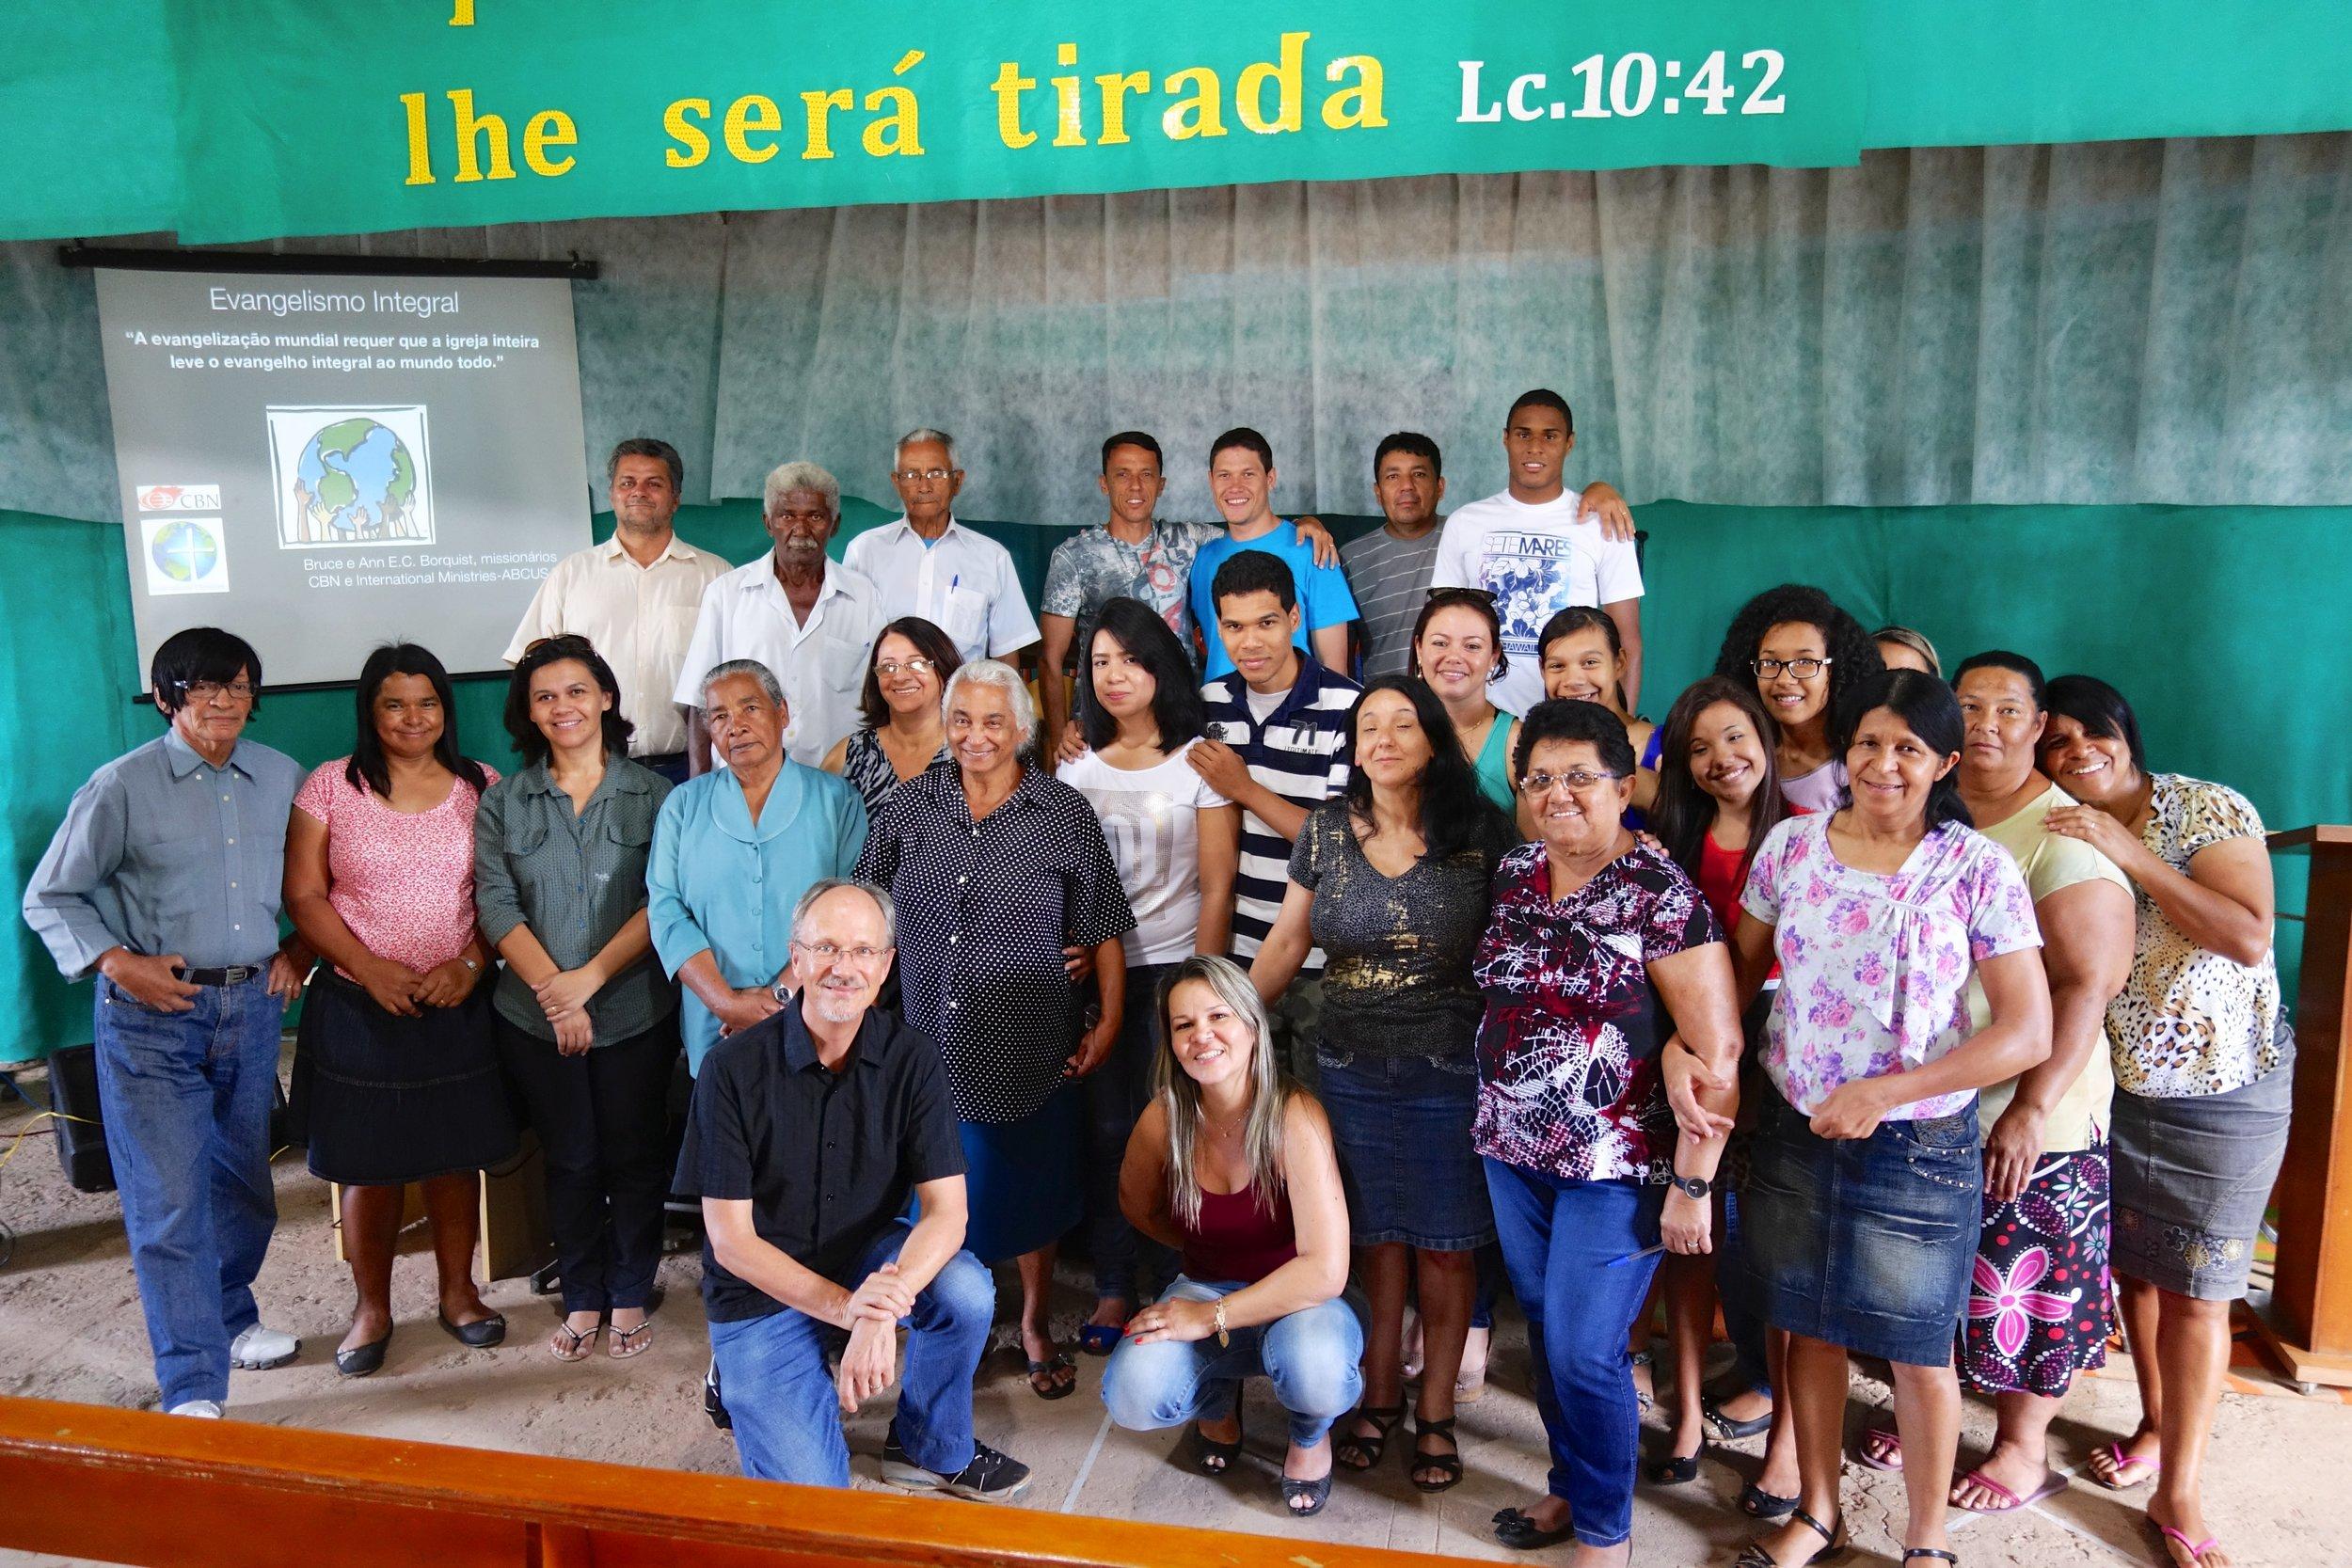 2014-02-01, Planaltina-DF, IBN Nova Jerusalem, Evangelismo Integral, Participantes 2